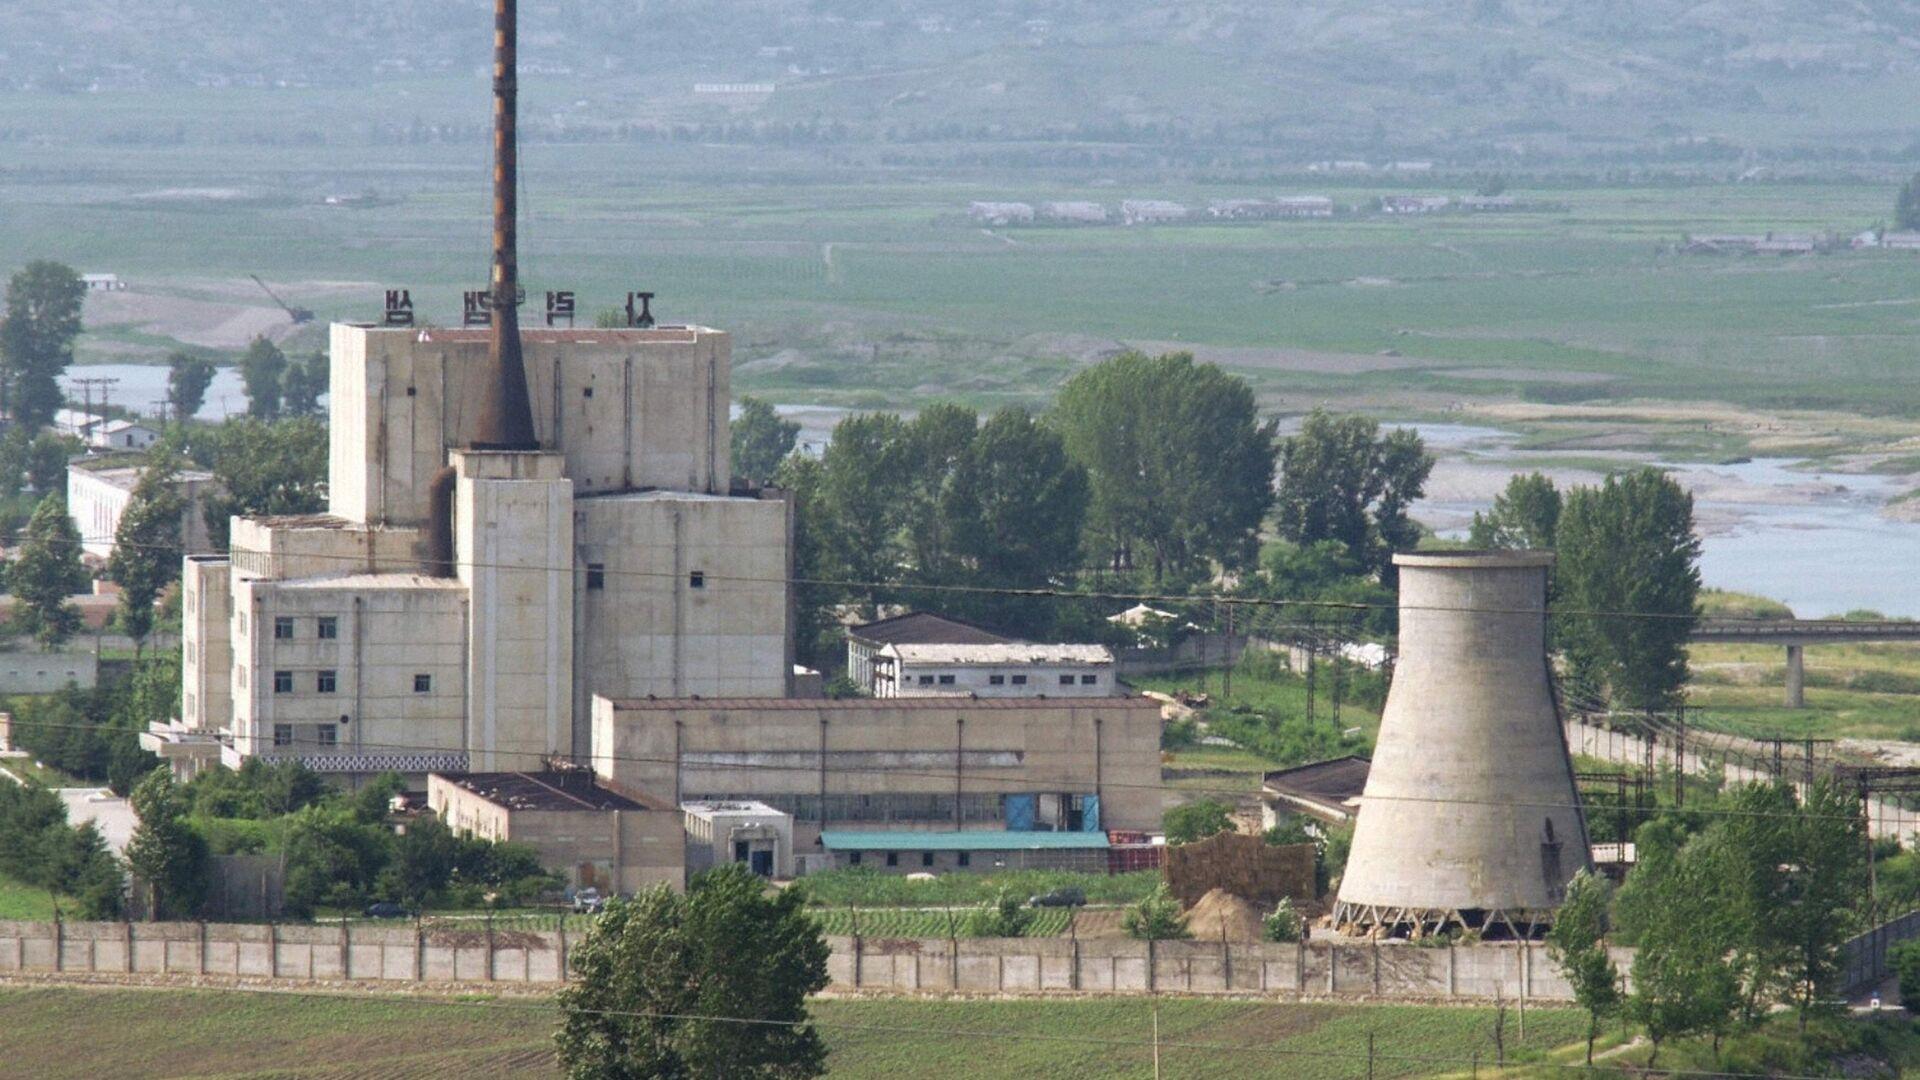 Centro nuclear de Yongbyon en Corea del Norte - Sputnik Mundo, 1920, 30.08.2021